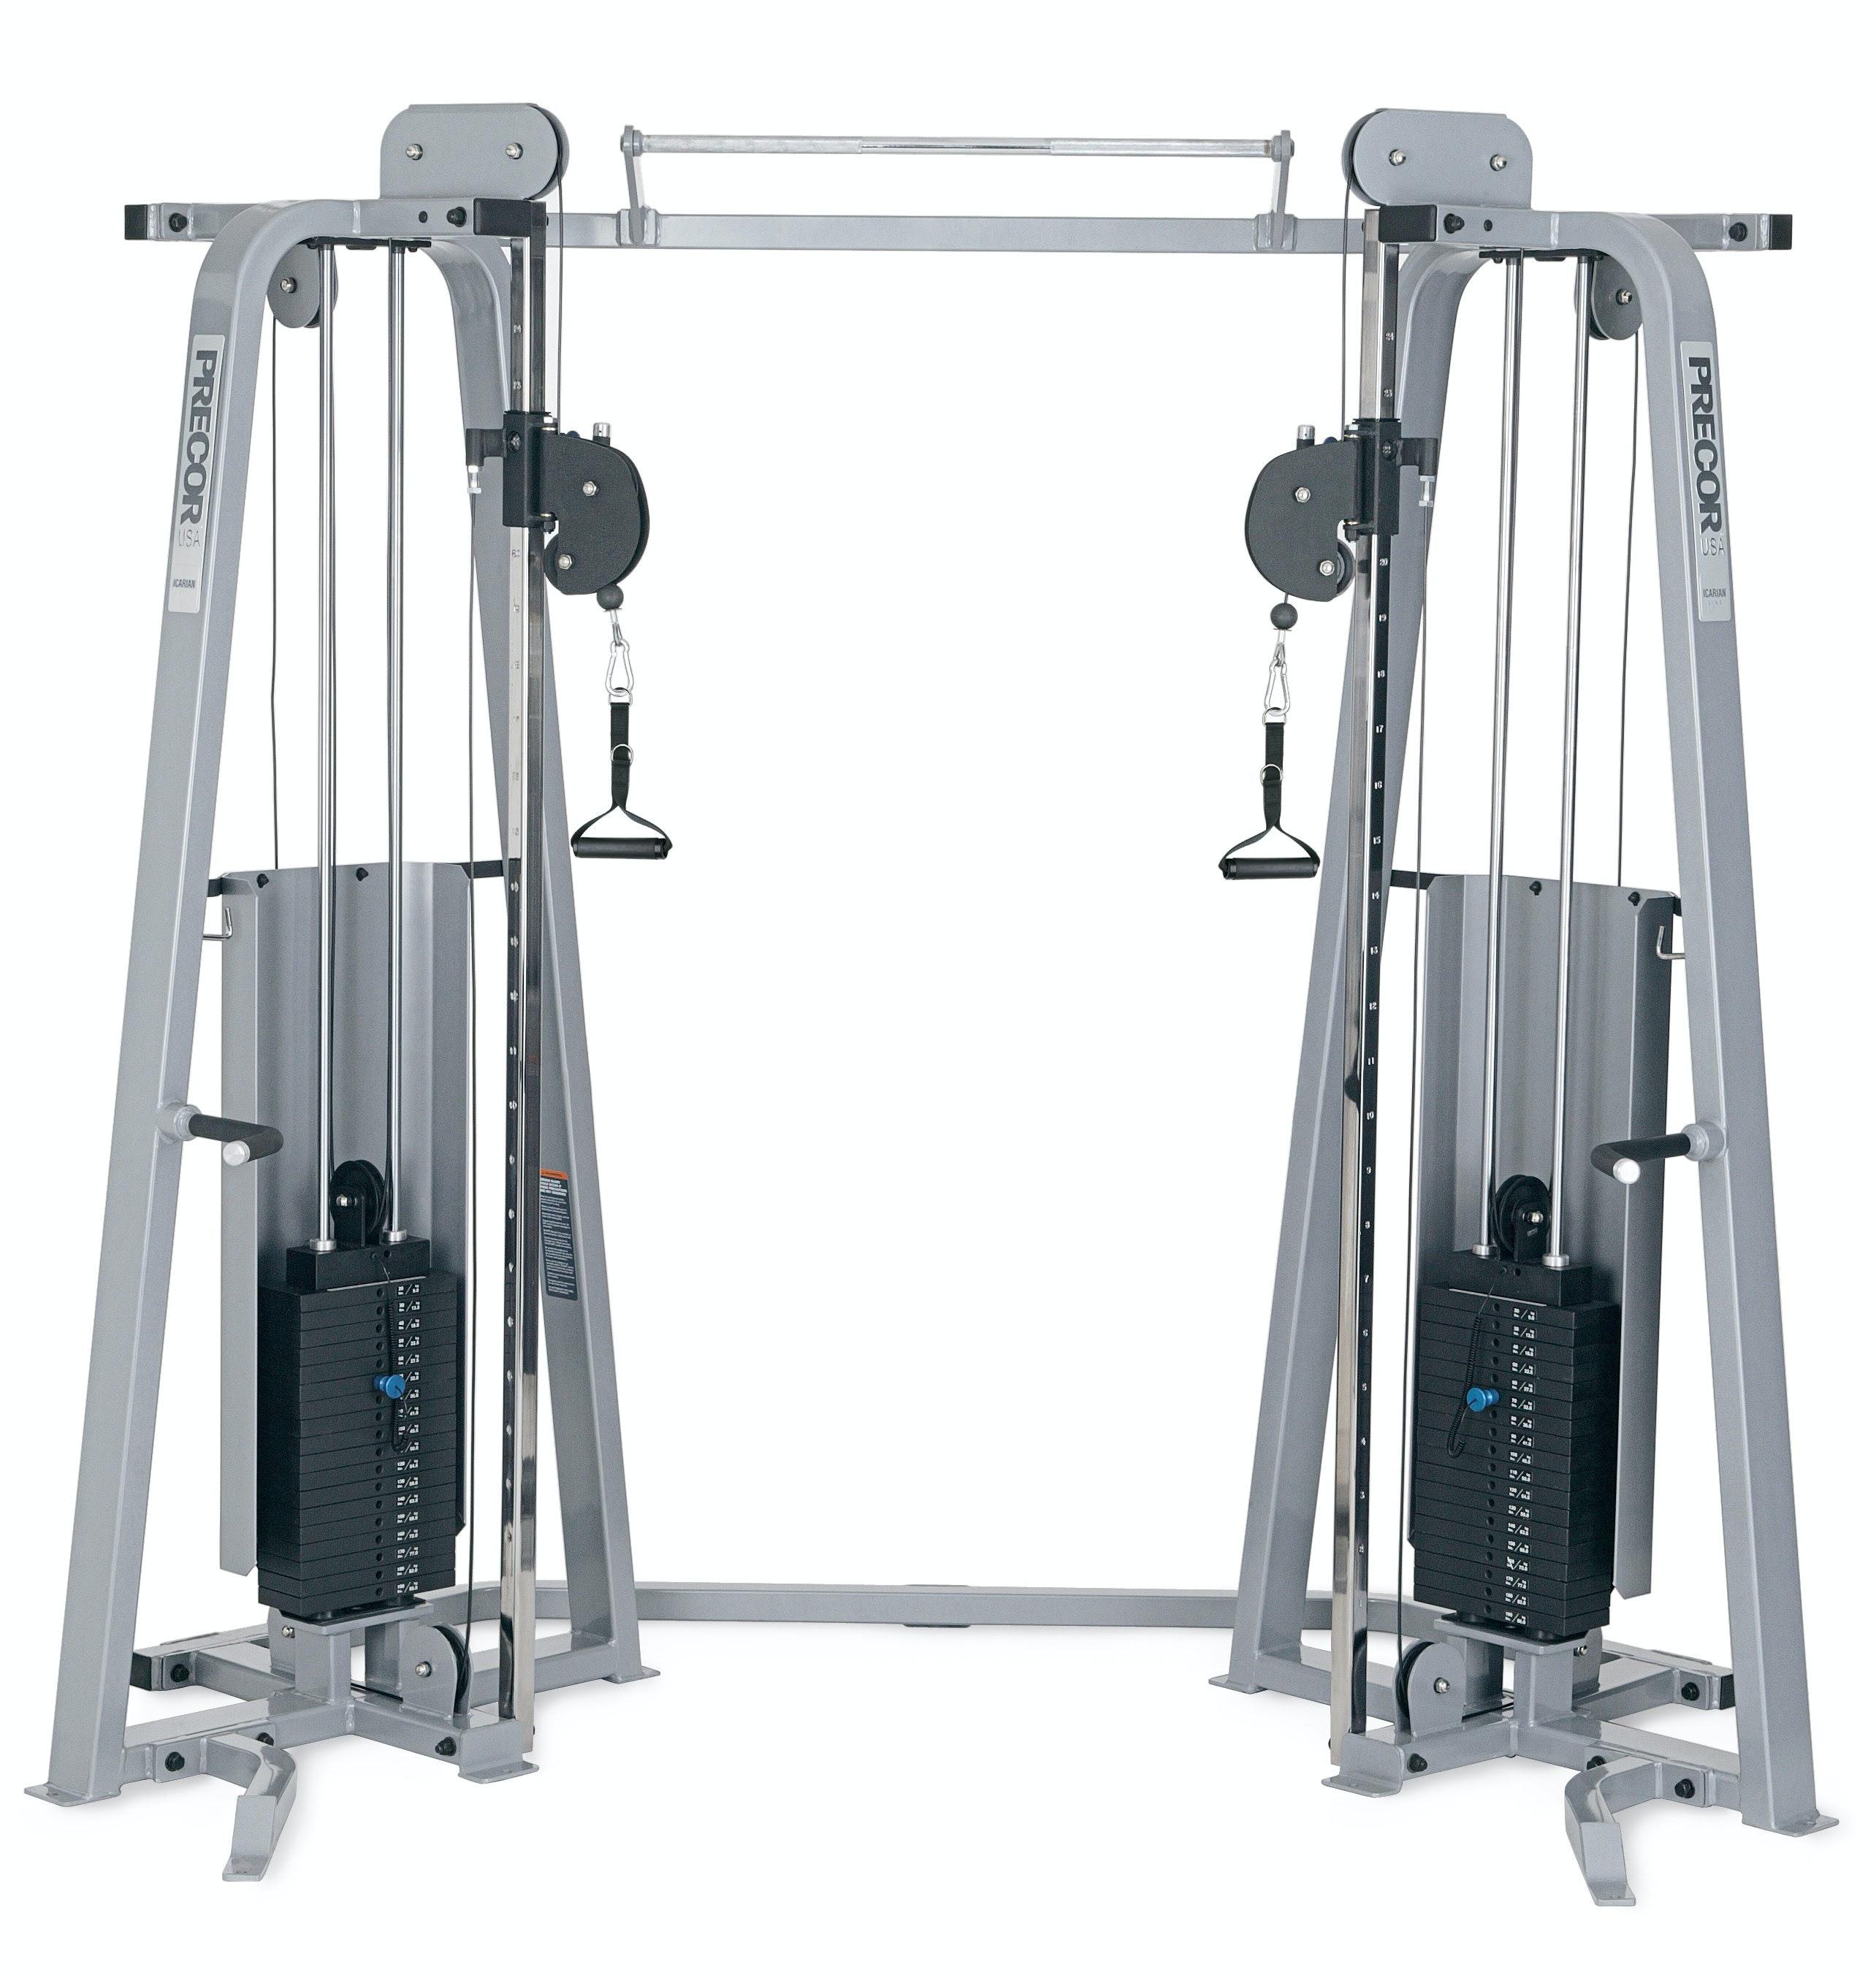 Precor USA Icarian Line Exercise Machine